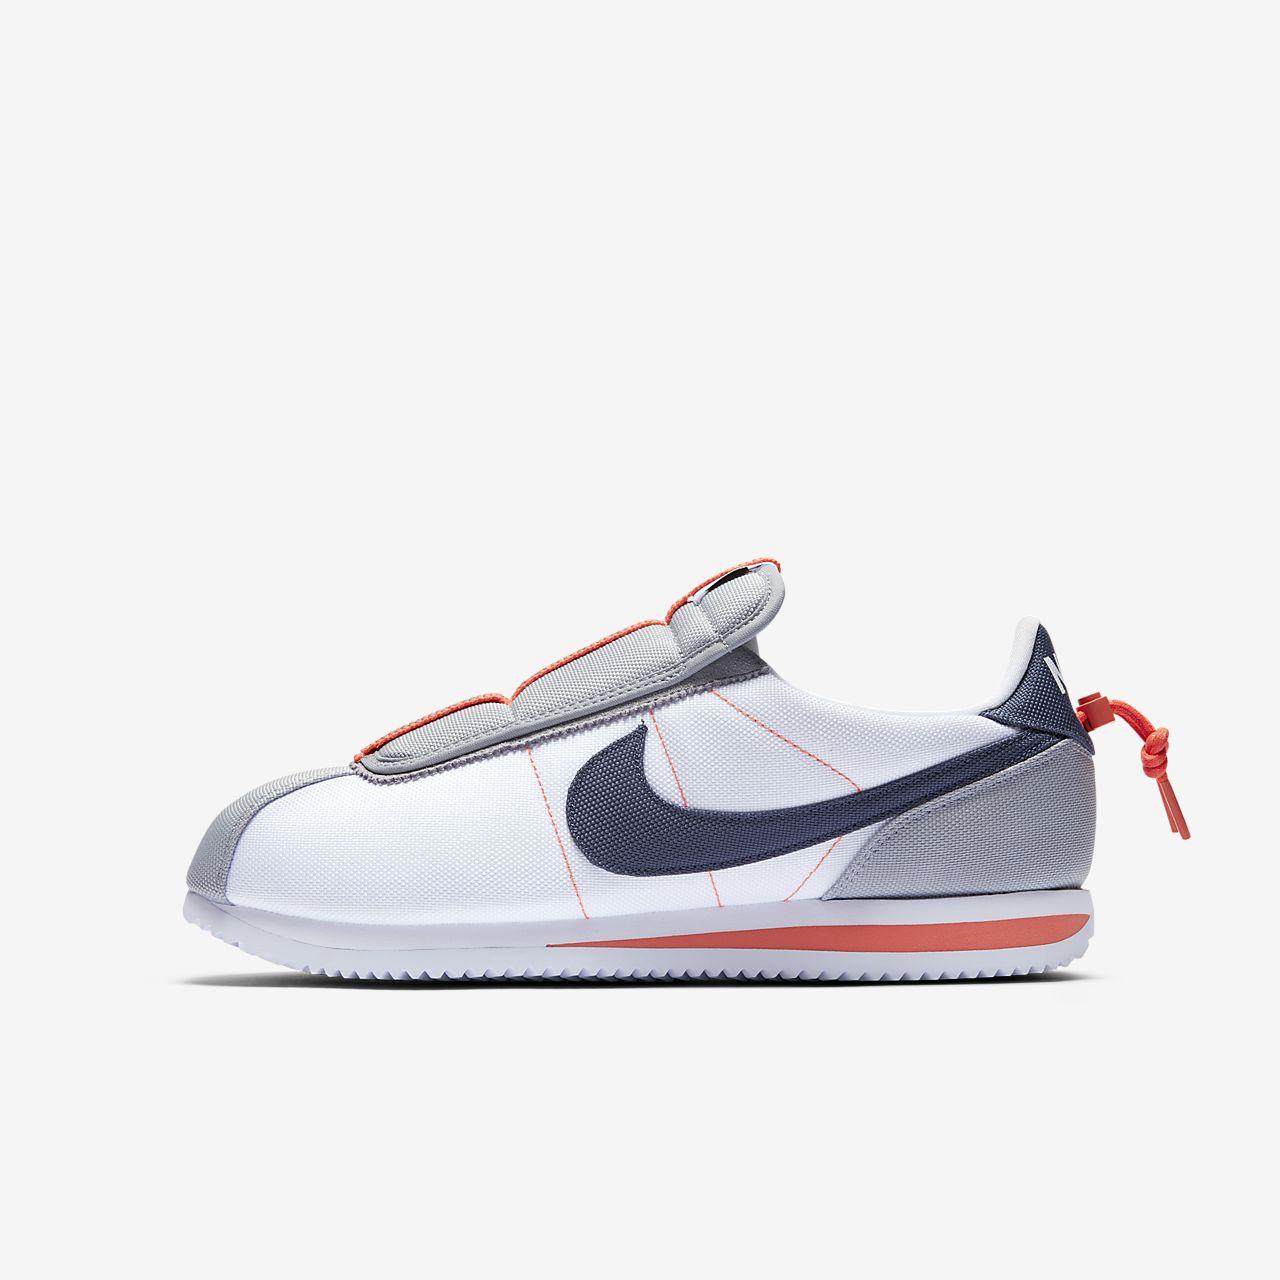 Calzado para hombre Nike Cortez Kenny IV